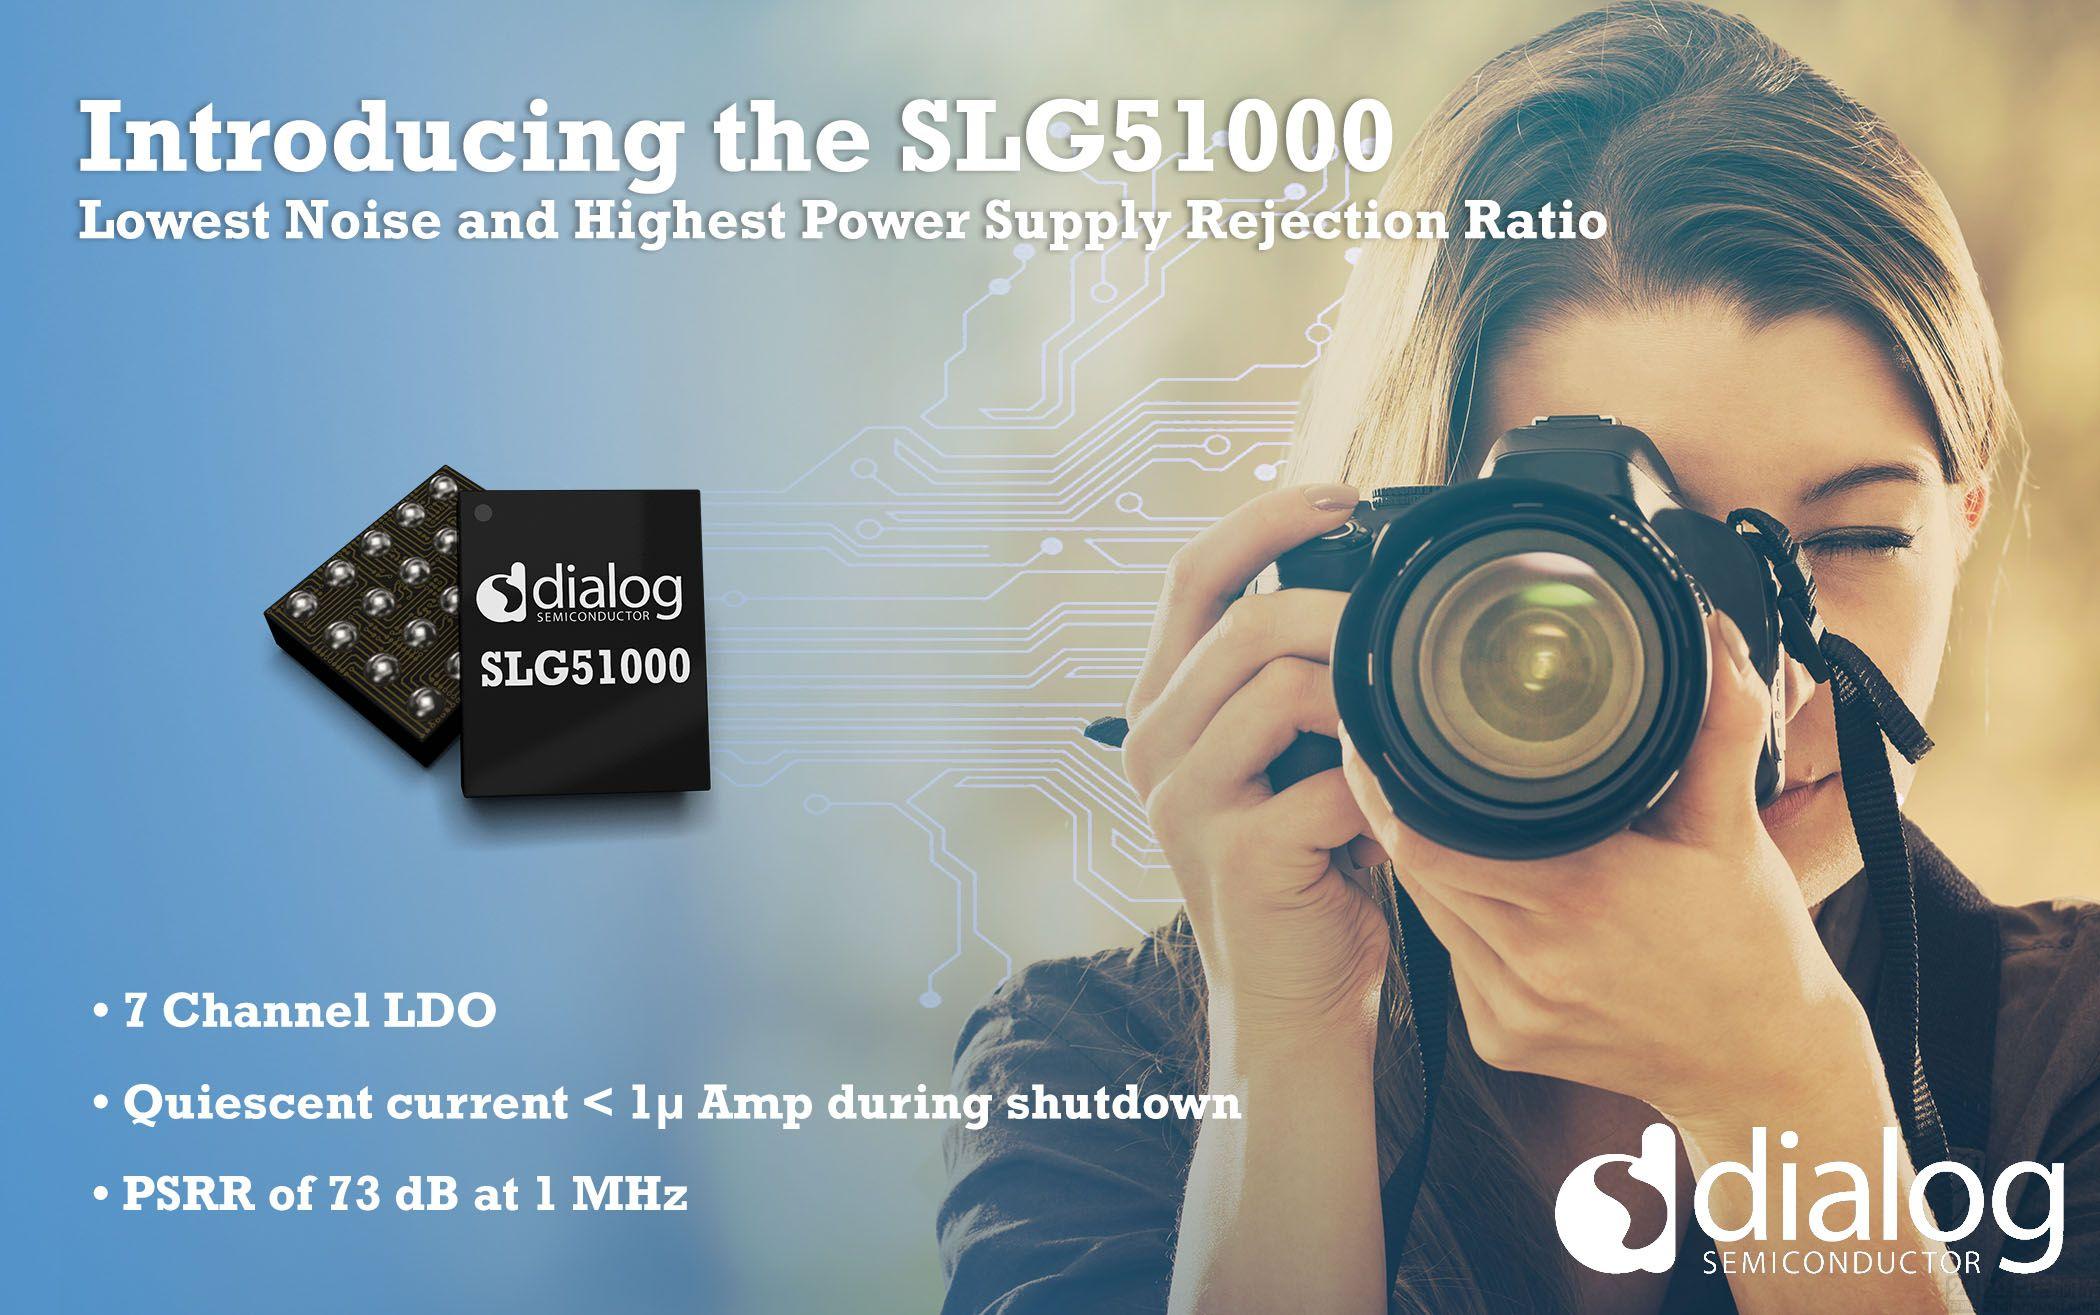 Dialog 公司推出具有最低绝对噪声和最高电源抑制比性能的可配置多通道低压差线性稳压器